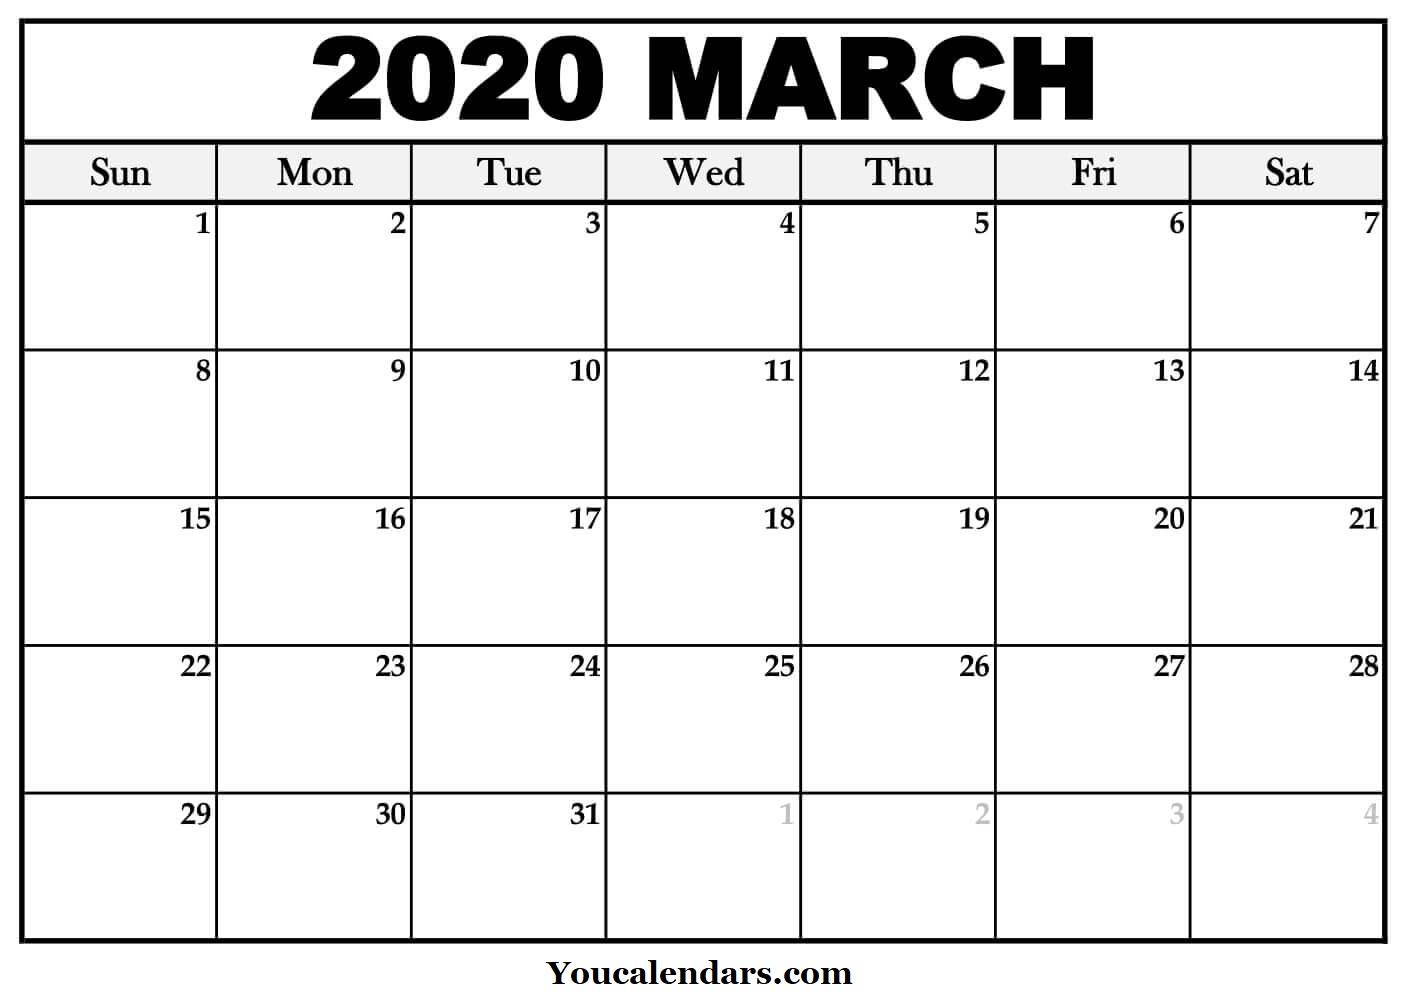 March 2020 Calendar Australia Free Pdf - You Calendars